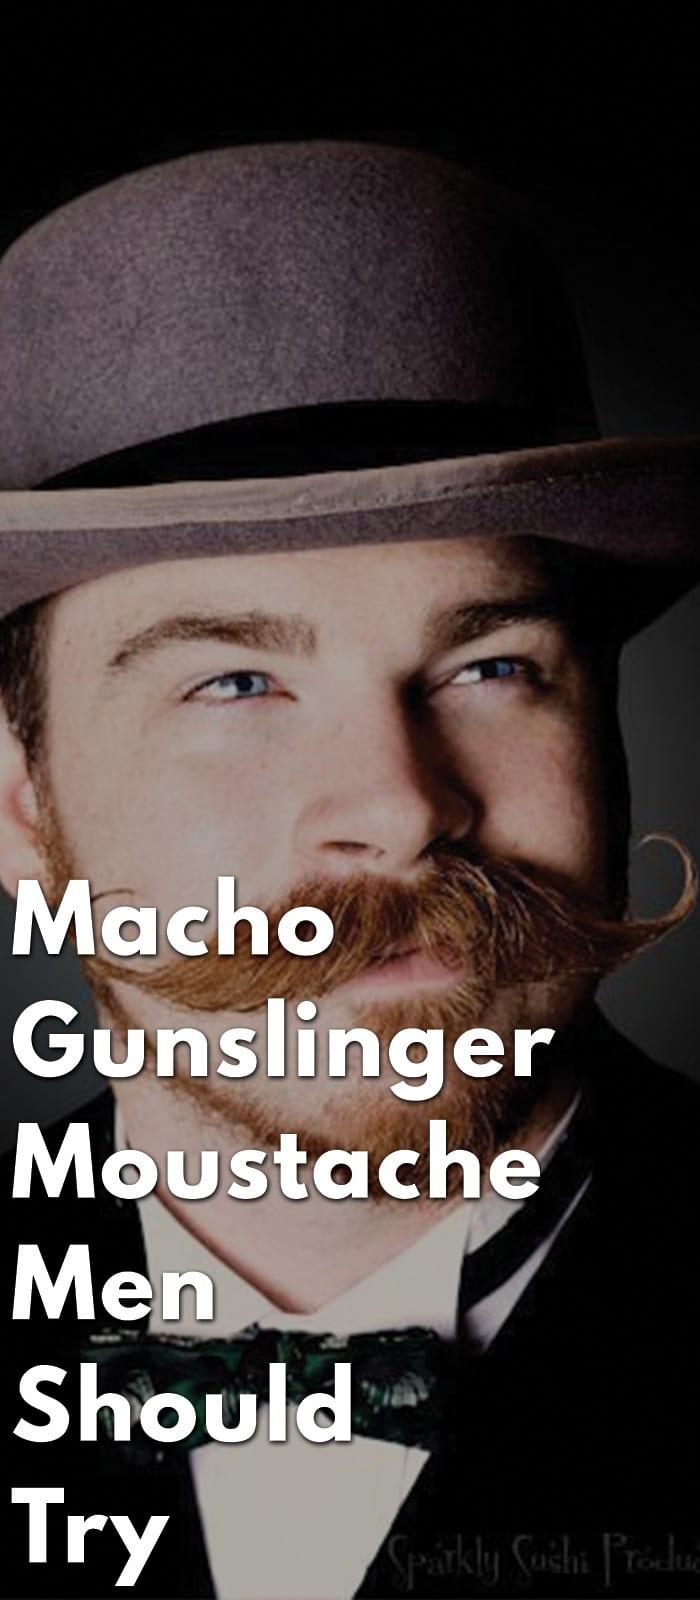 Macho-Gunslinger-Moustache-Men-Should-Try